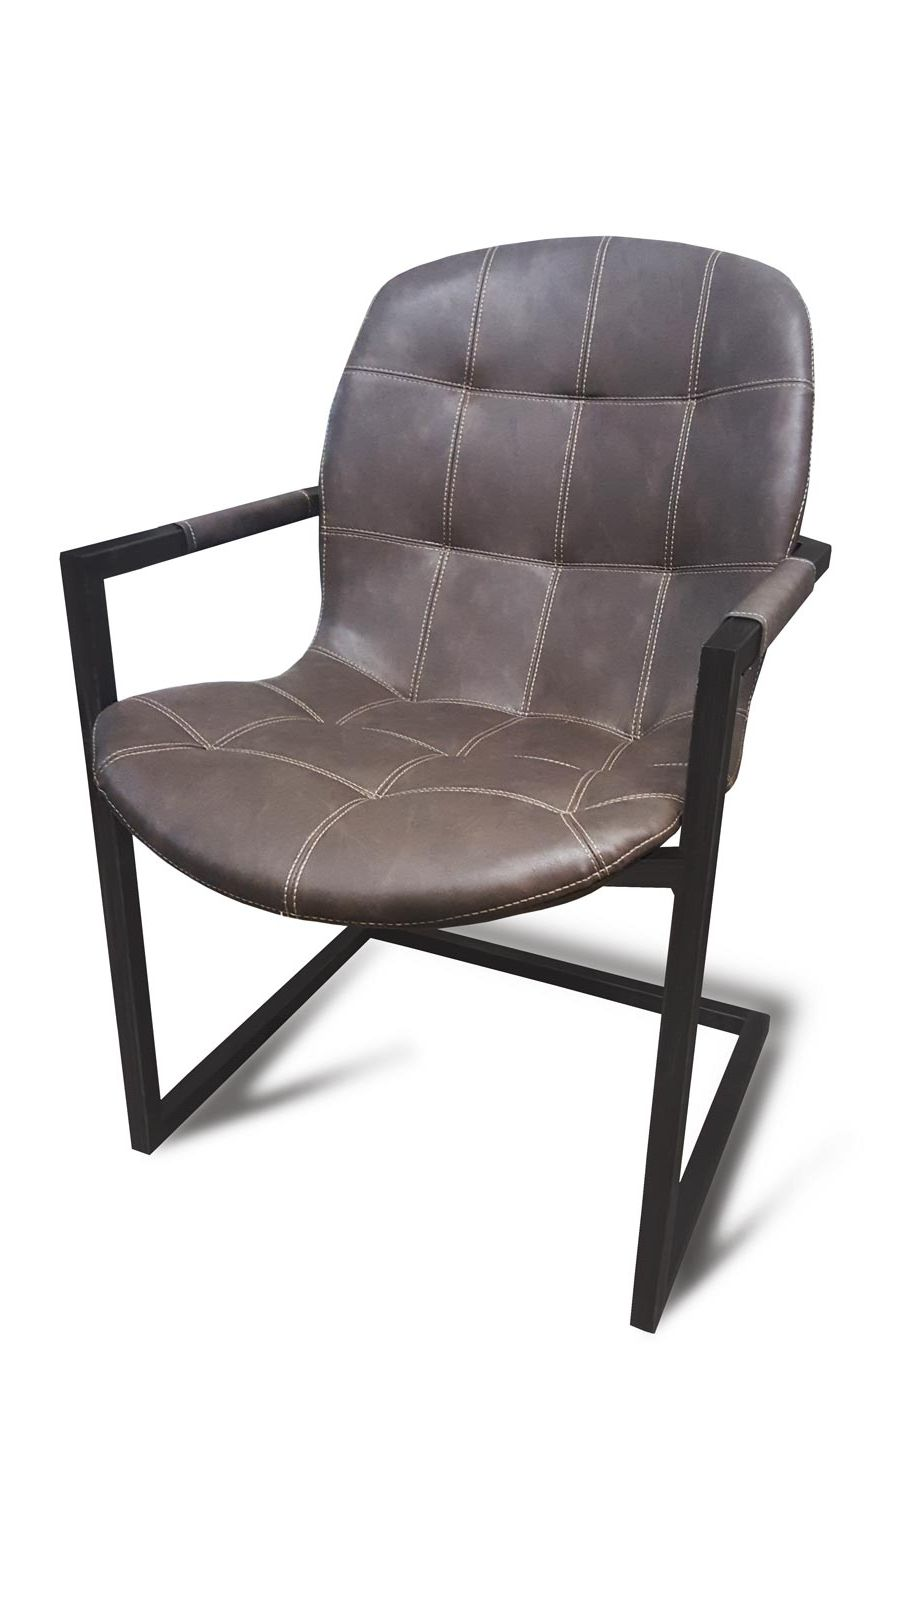 krzesła savanna